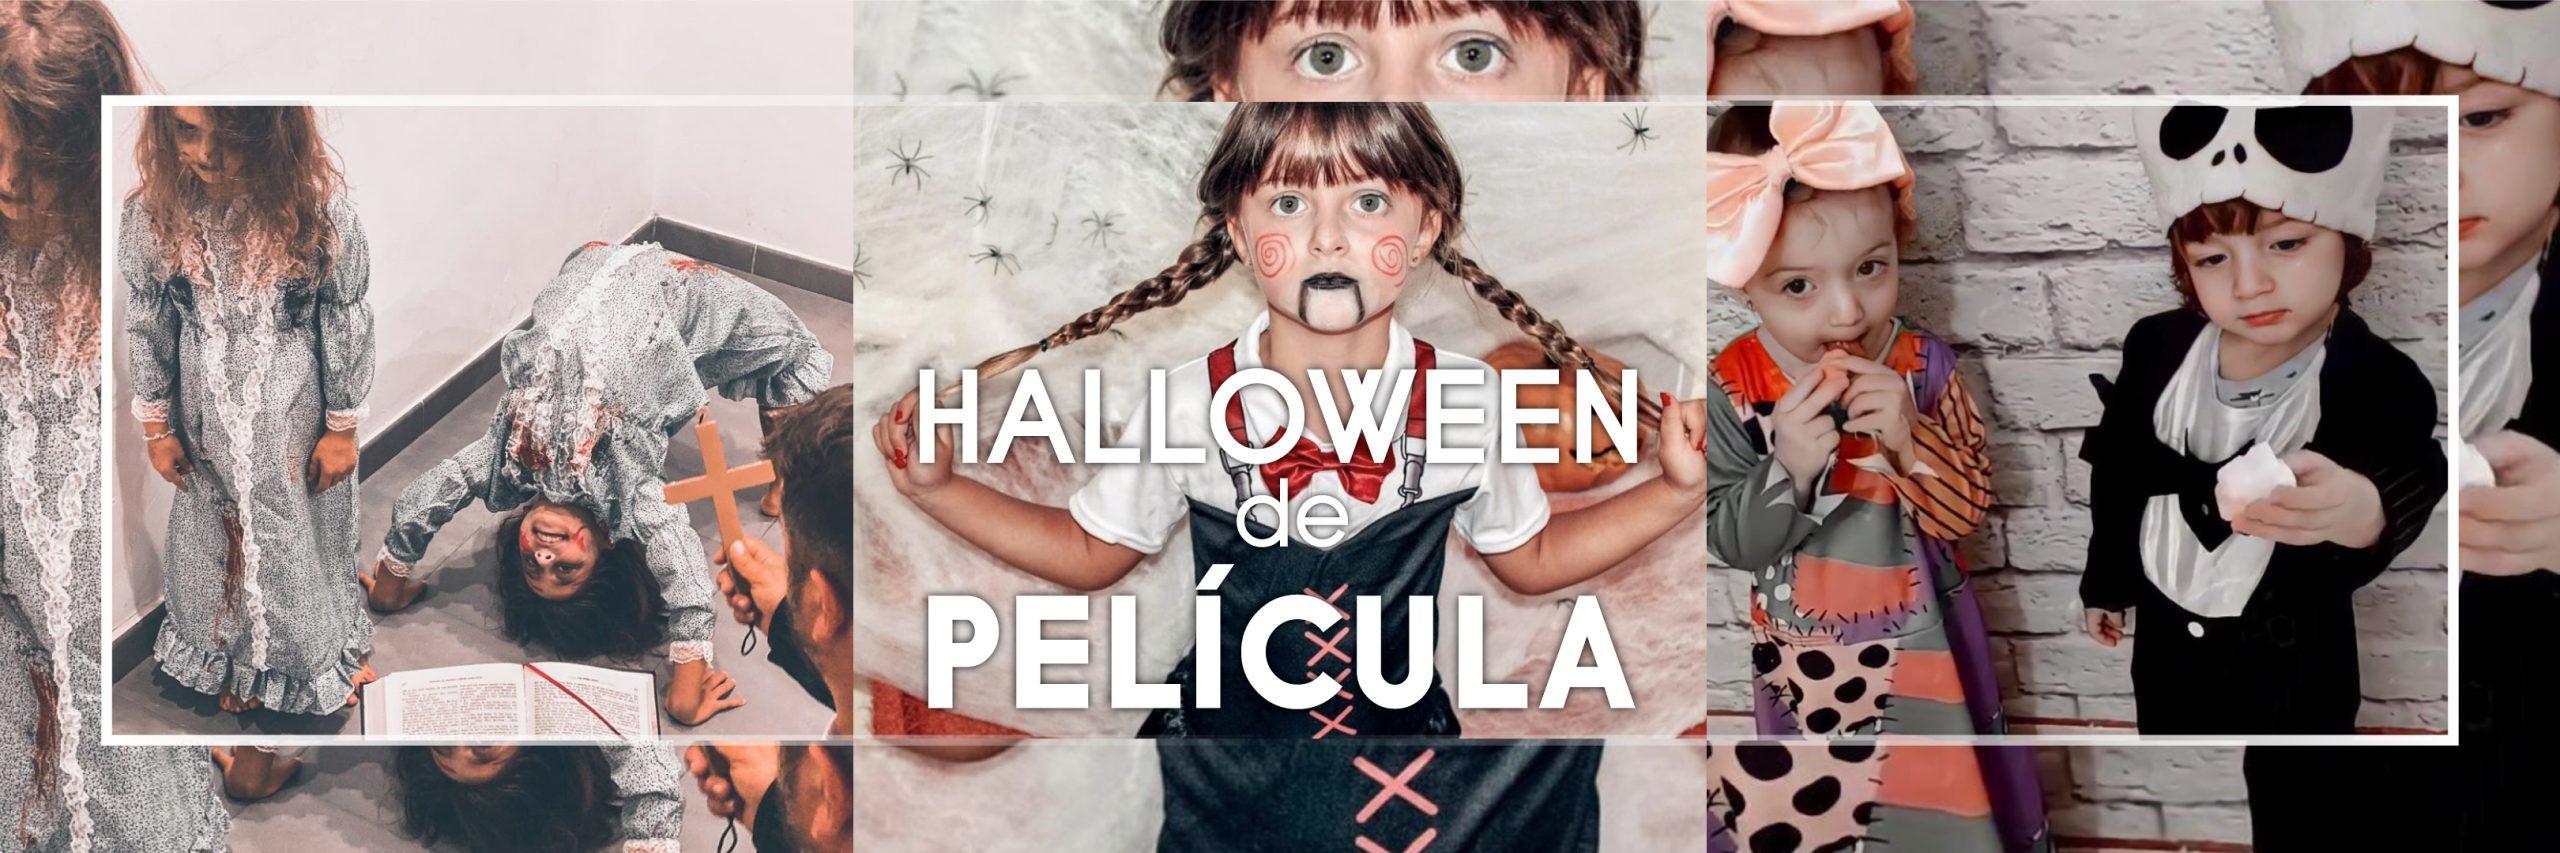 disfraces pelicula halloween venta mayorista